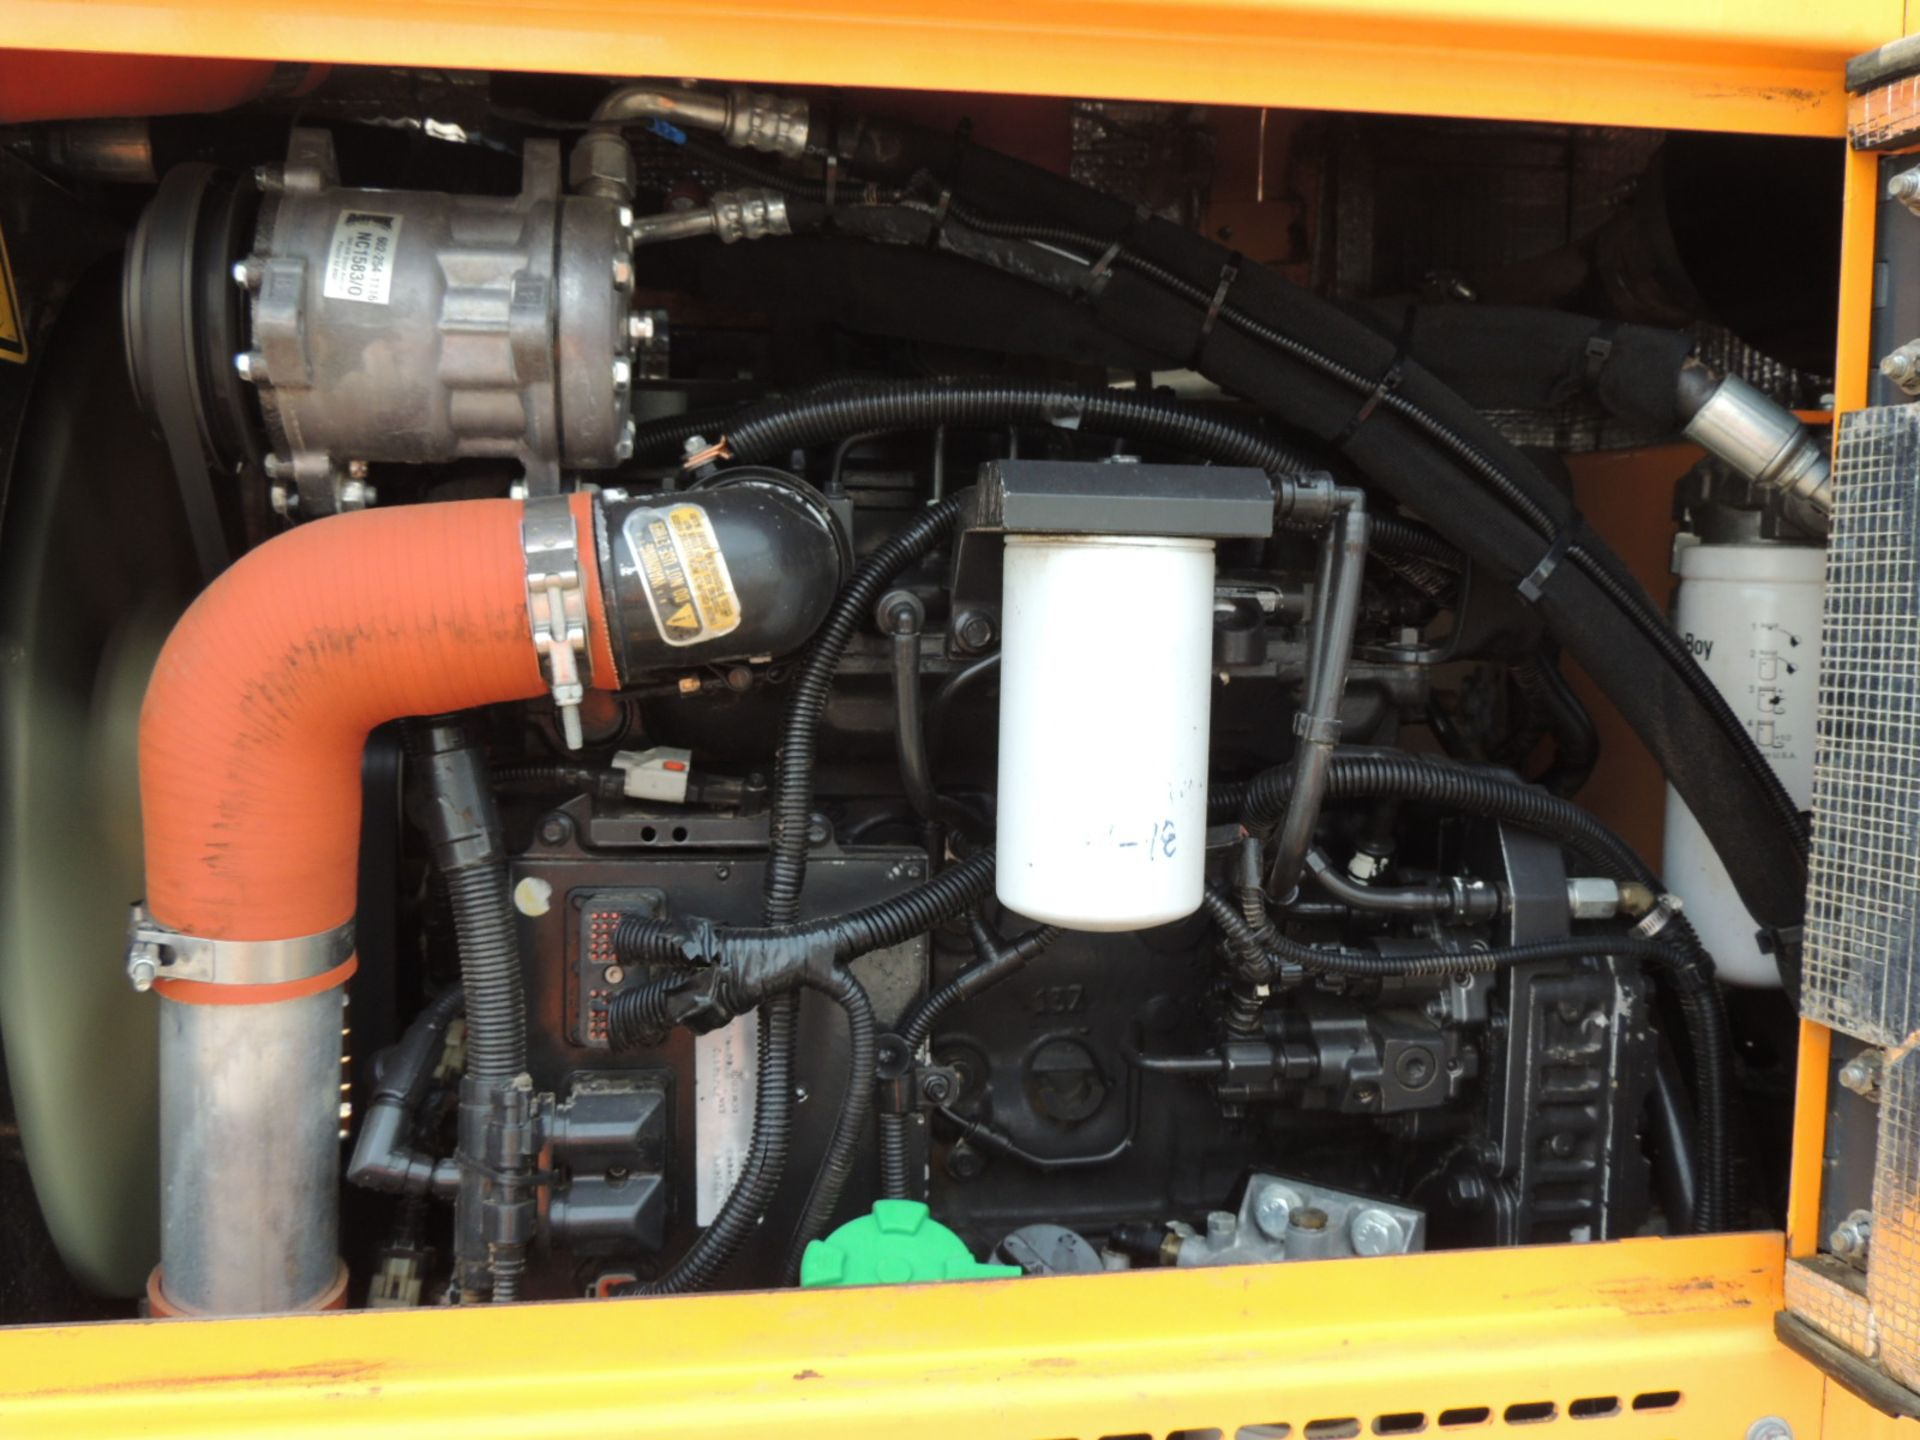 2015 Leeboy 685C Motor Grader, S/N 11909, Rear Ripper w/9-Shank Bar, Includes (5) Shanks, Front - Image 8 of 11